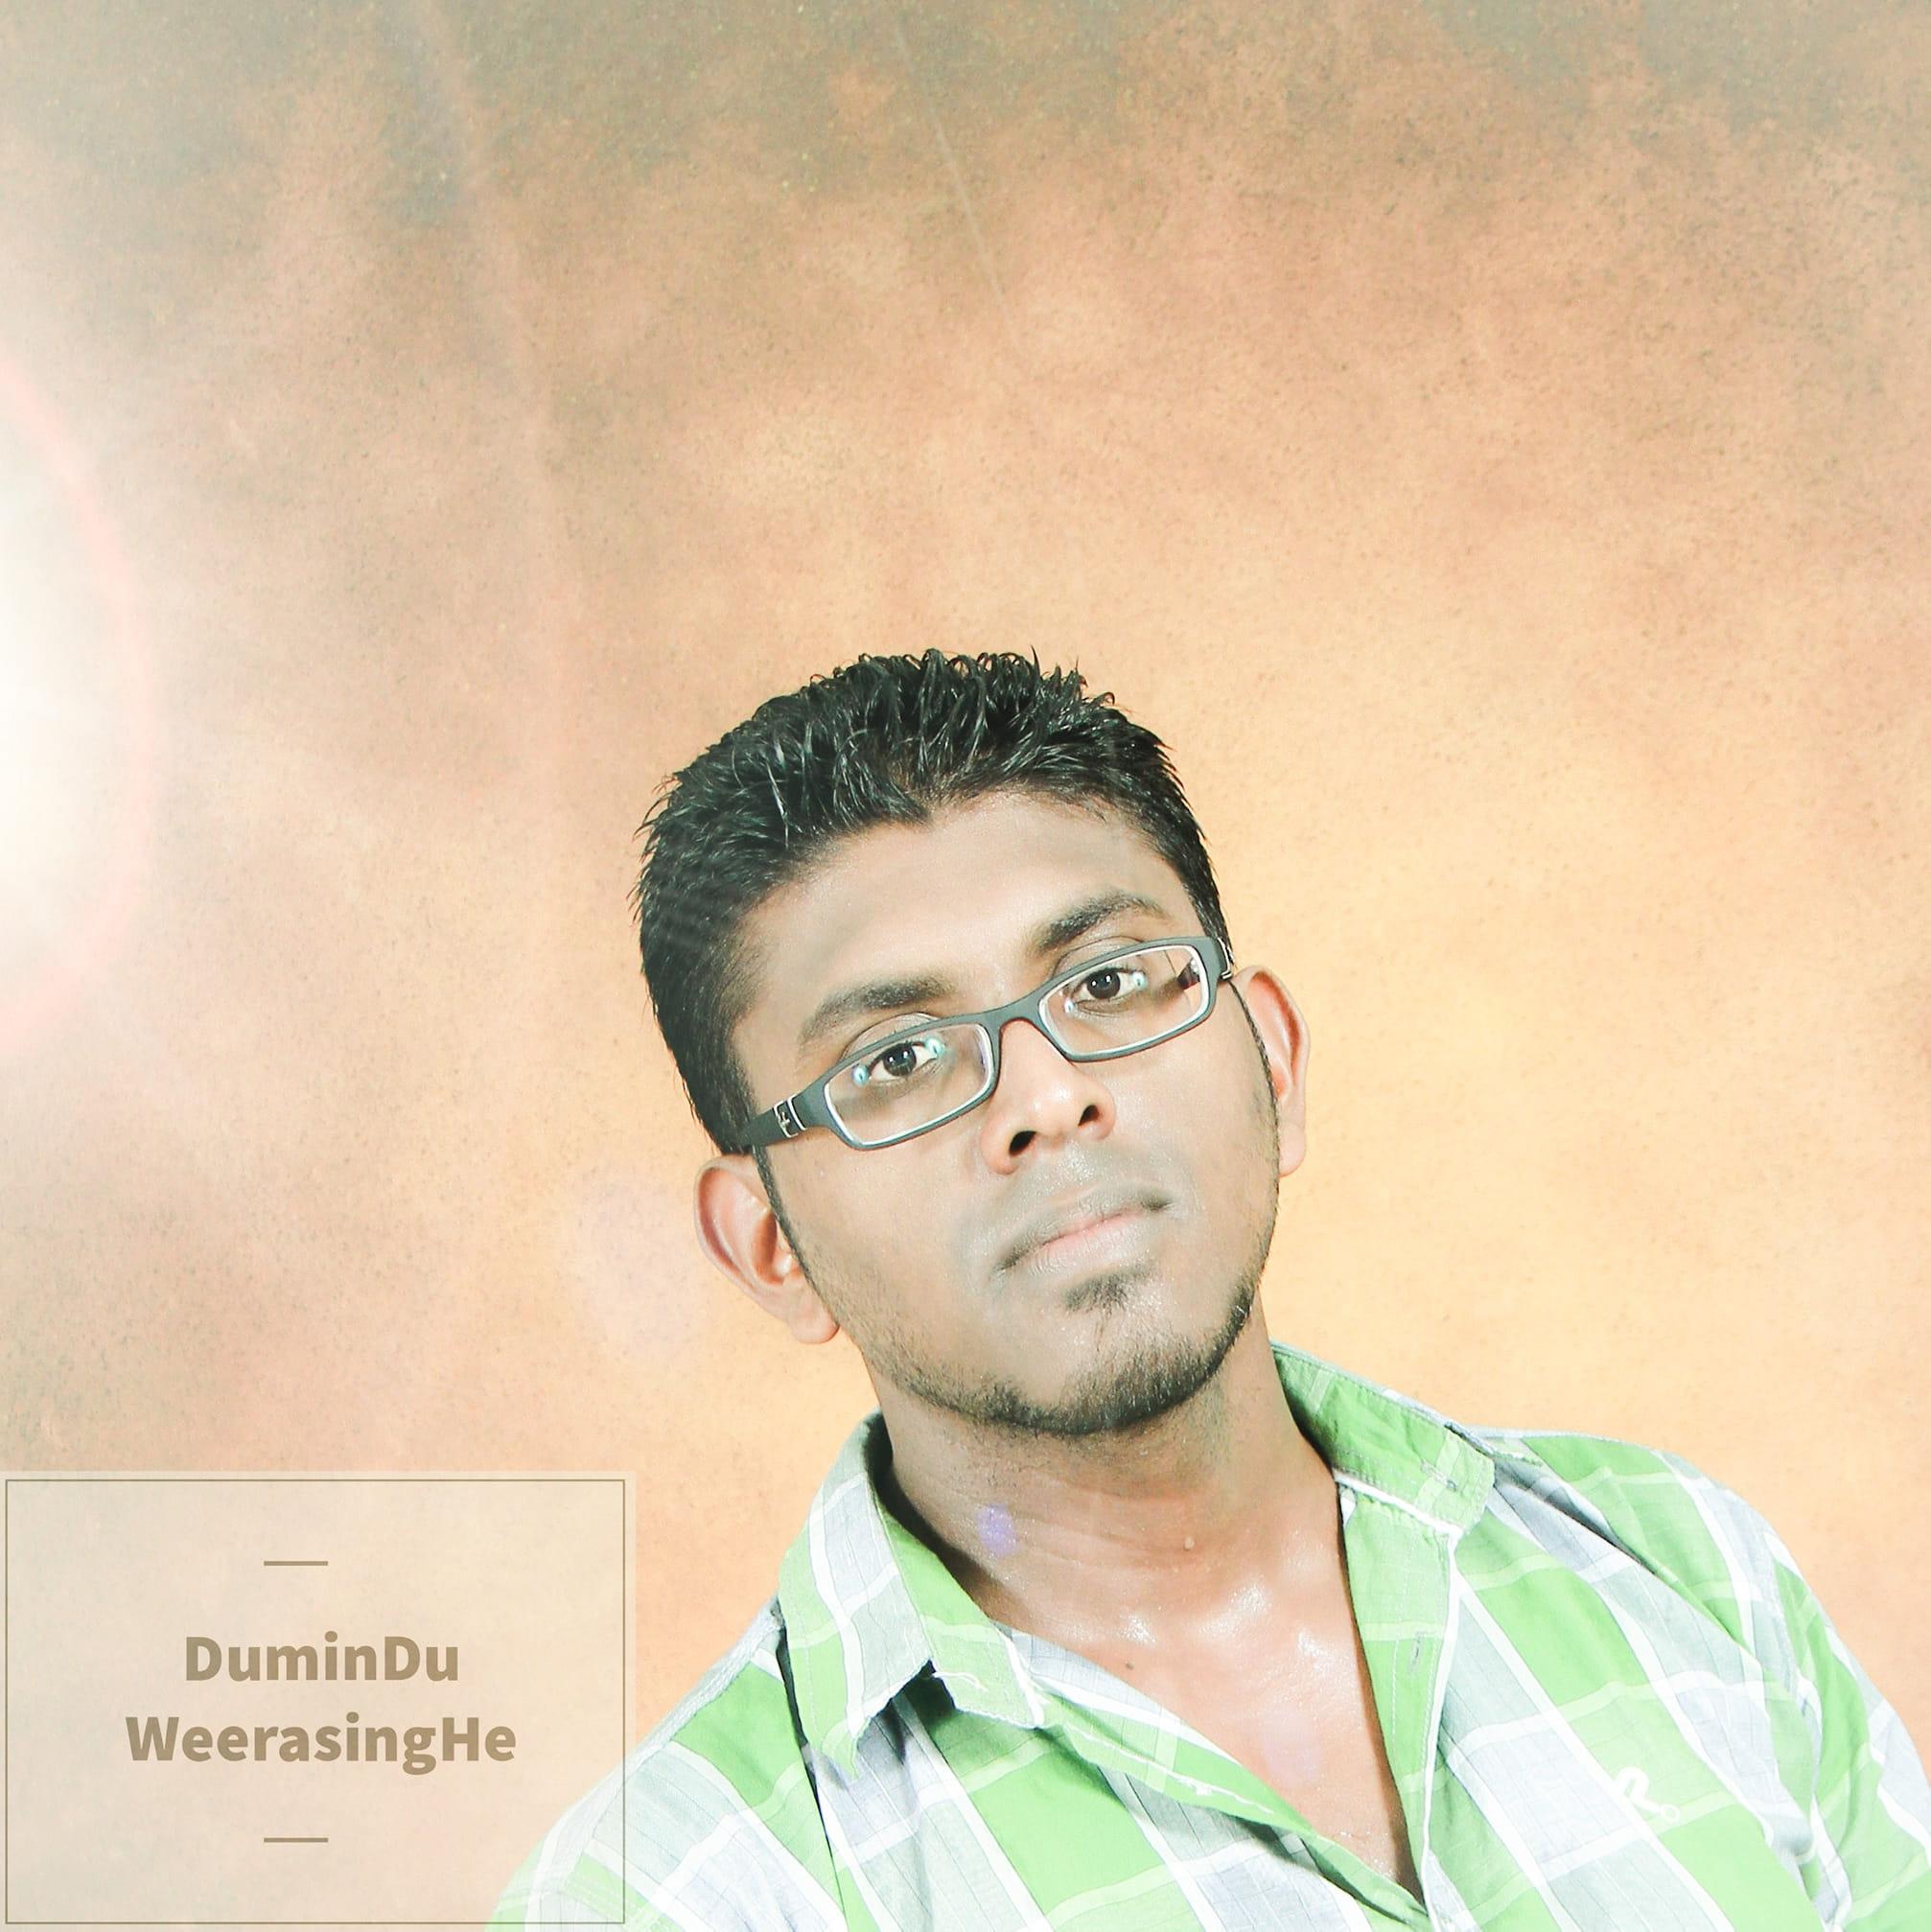 Dumindu Weerasinghe